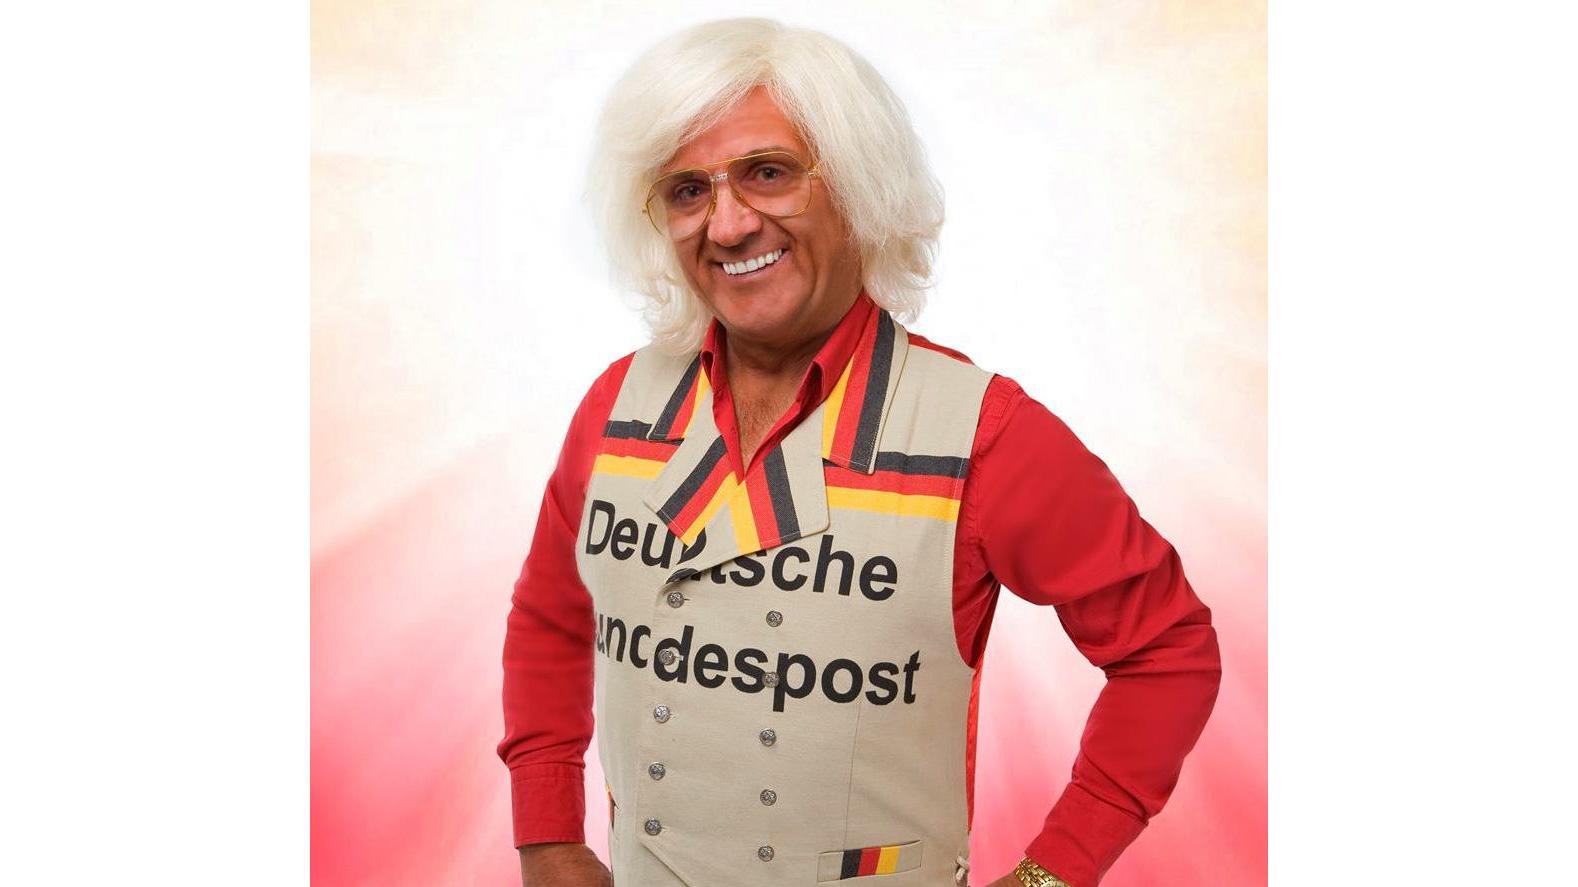 Thorsten van Lippe Biesterfeld